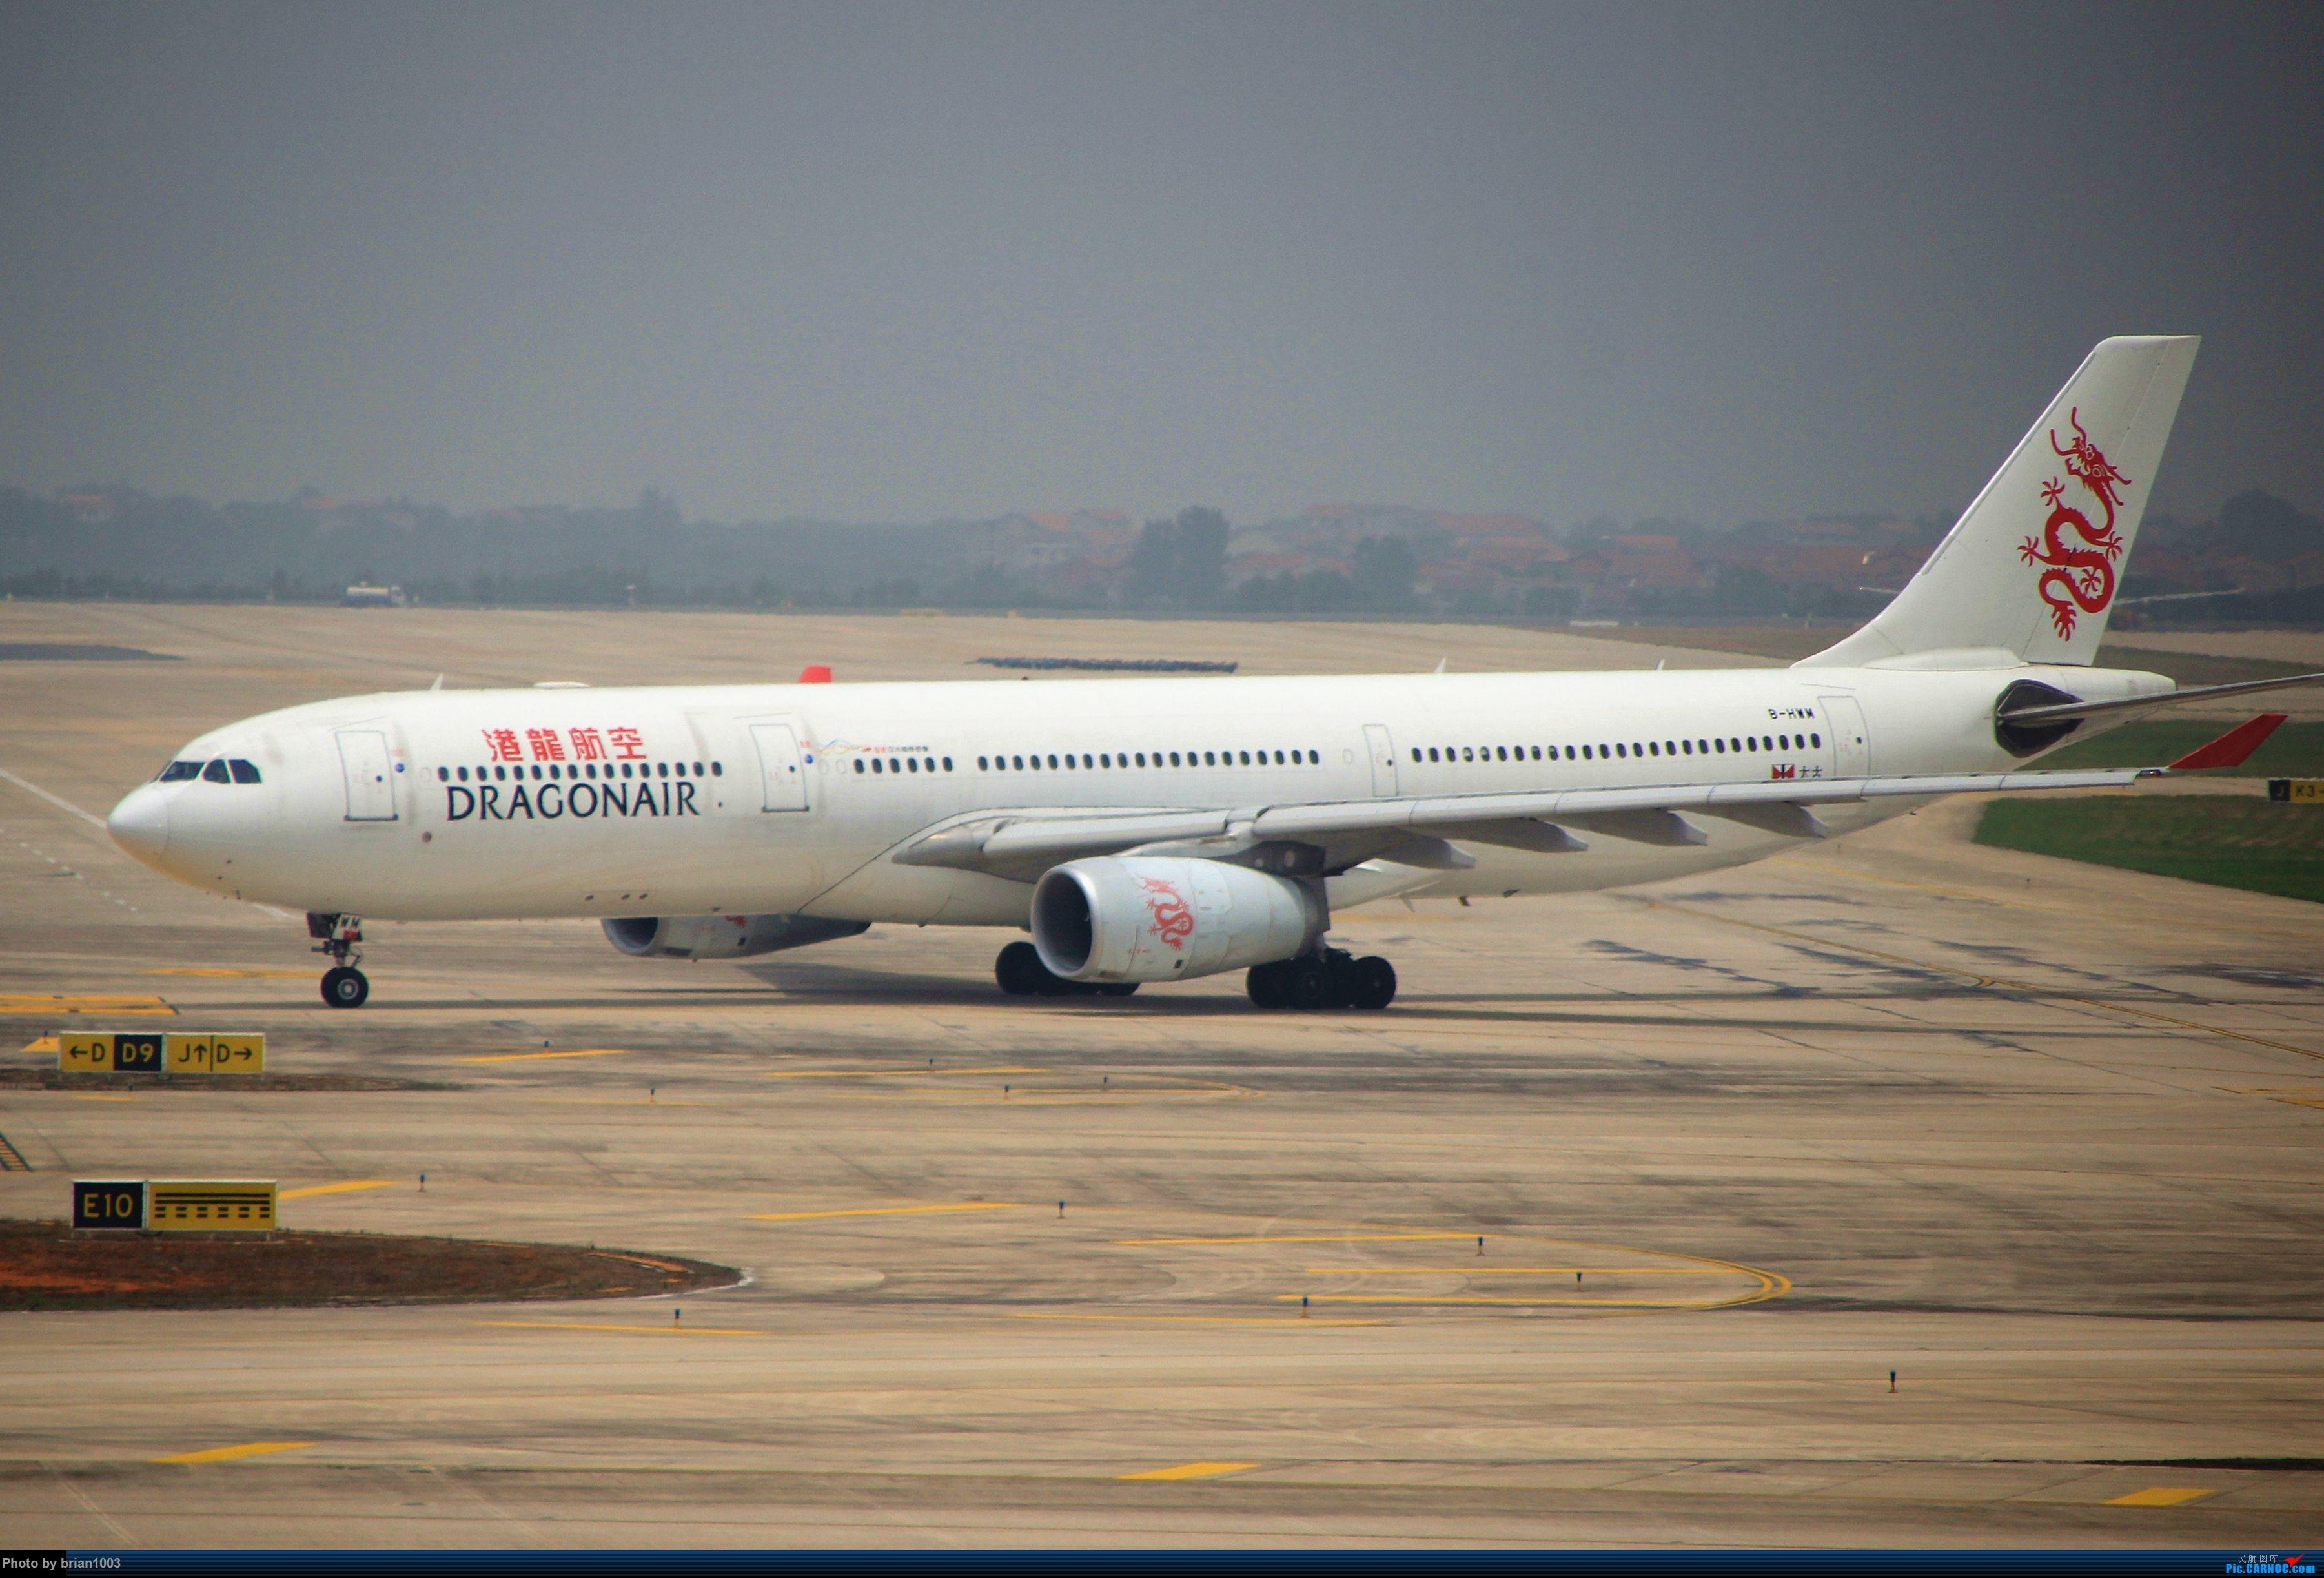 Re:[原创]WUH武汉天河机场拍机之二跑最后忙碌时 AIRBUS A330-300 B-HWM 中国武汉天河国际机场